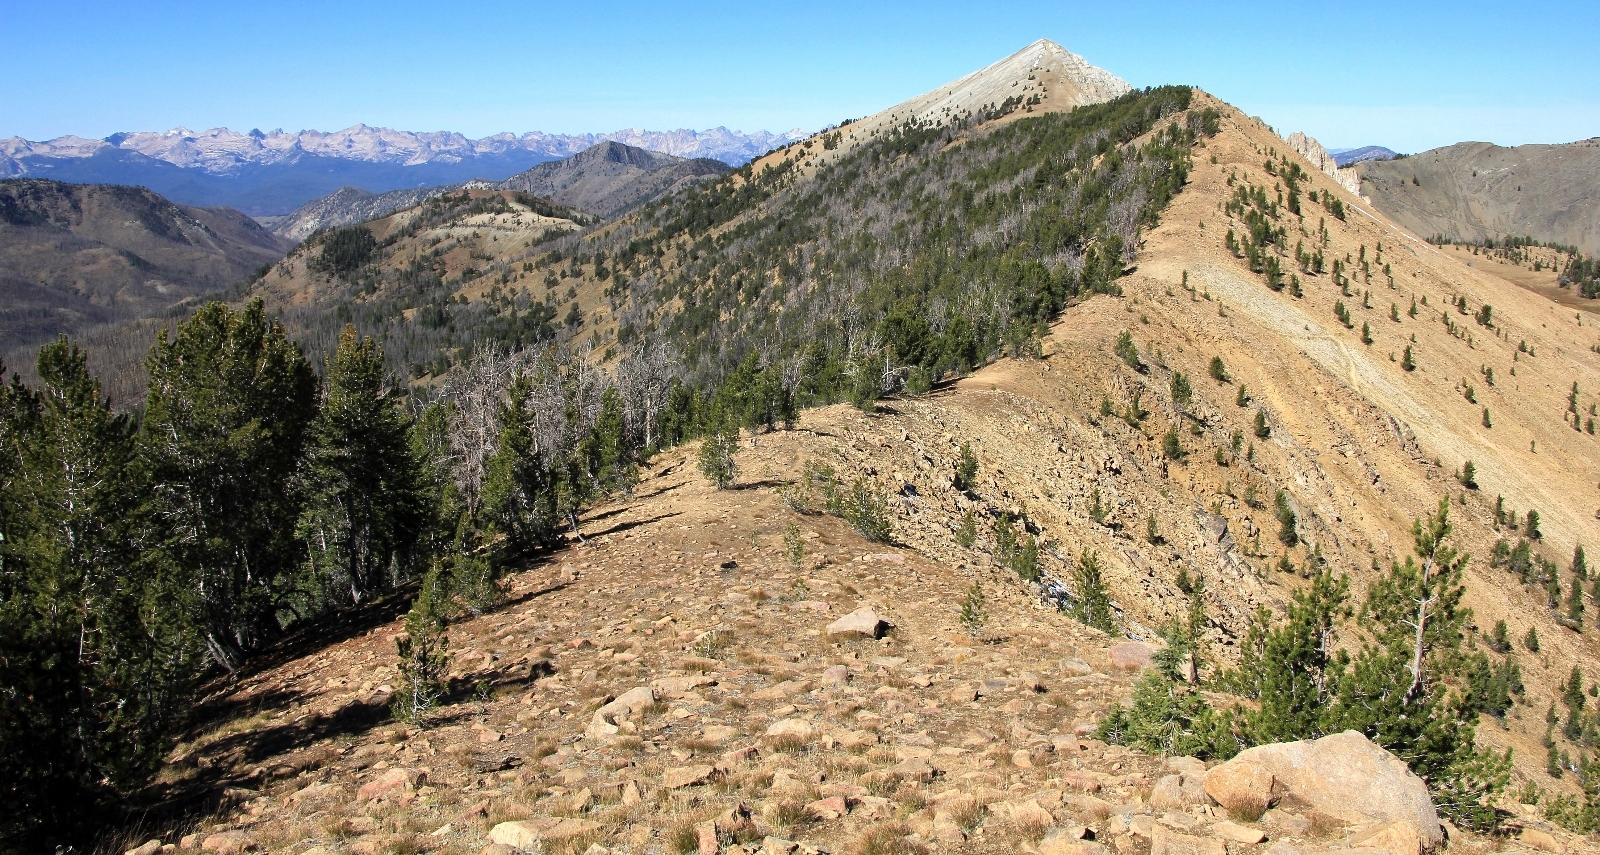 09-22-15 Born Lakes ridgeline hike (61)